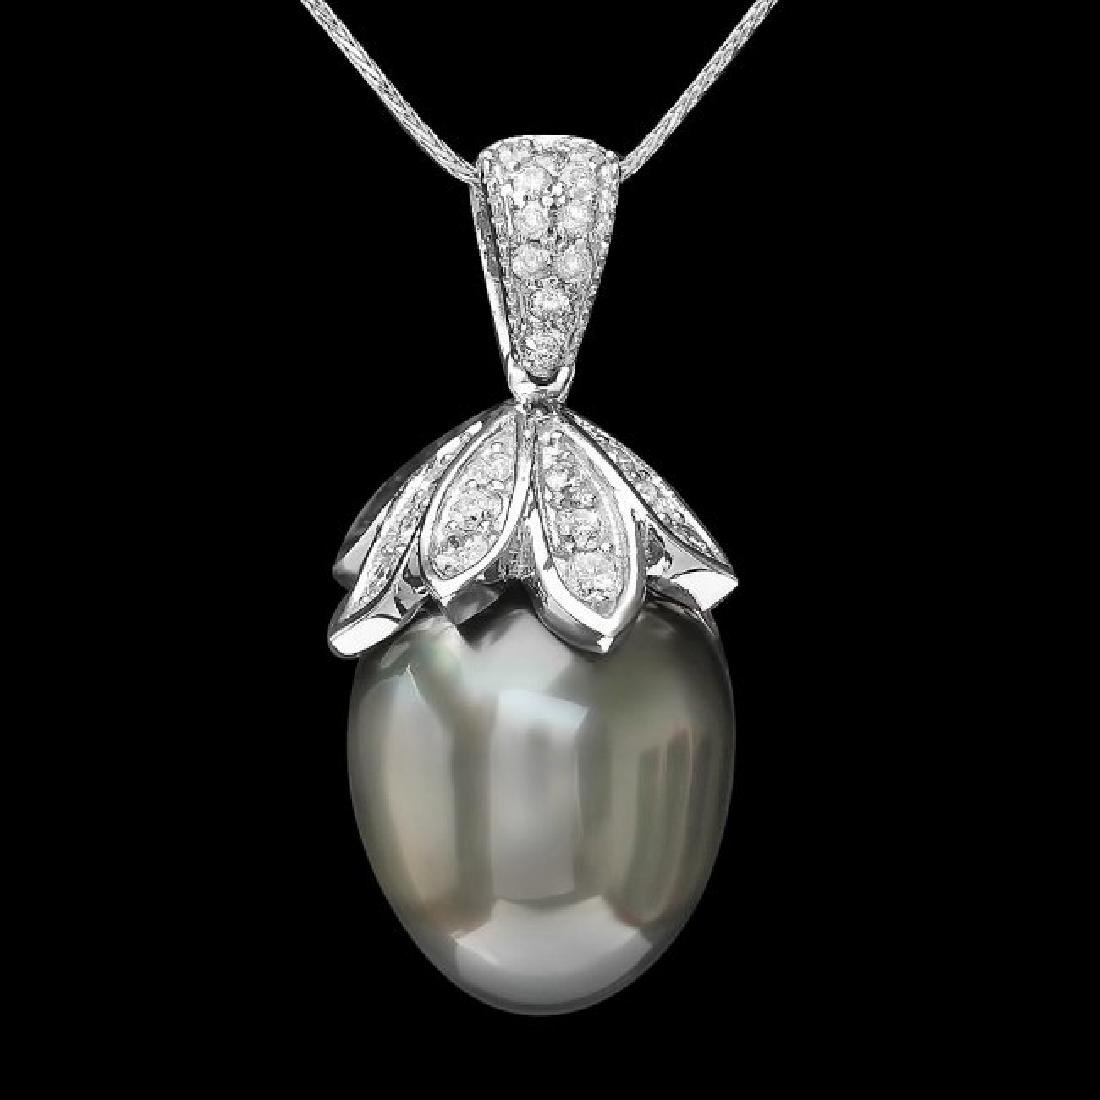 14k Gold 16 X 20mm Pearl 1.30ct Diamond Pendant - 2